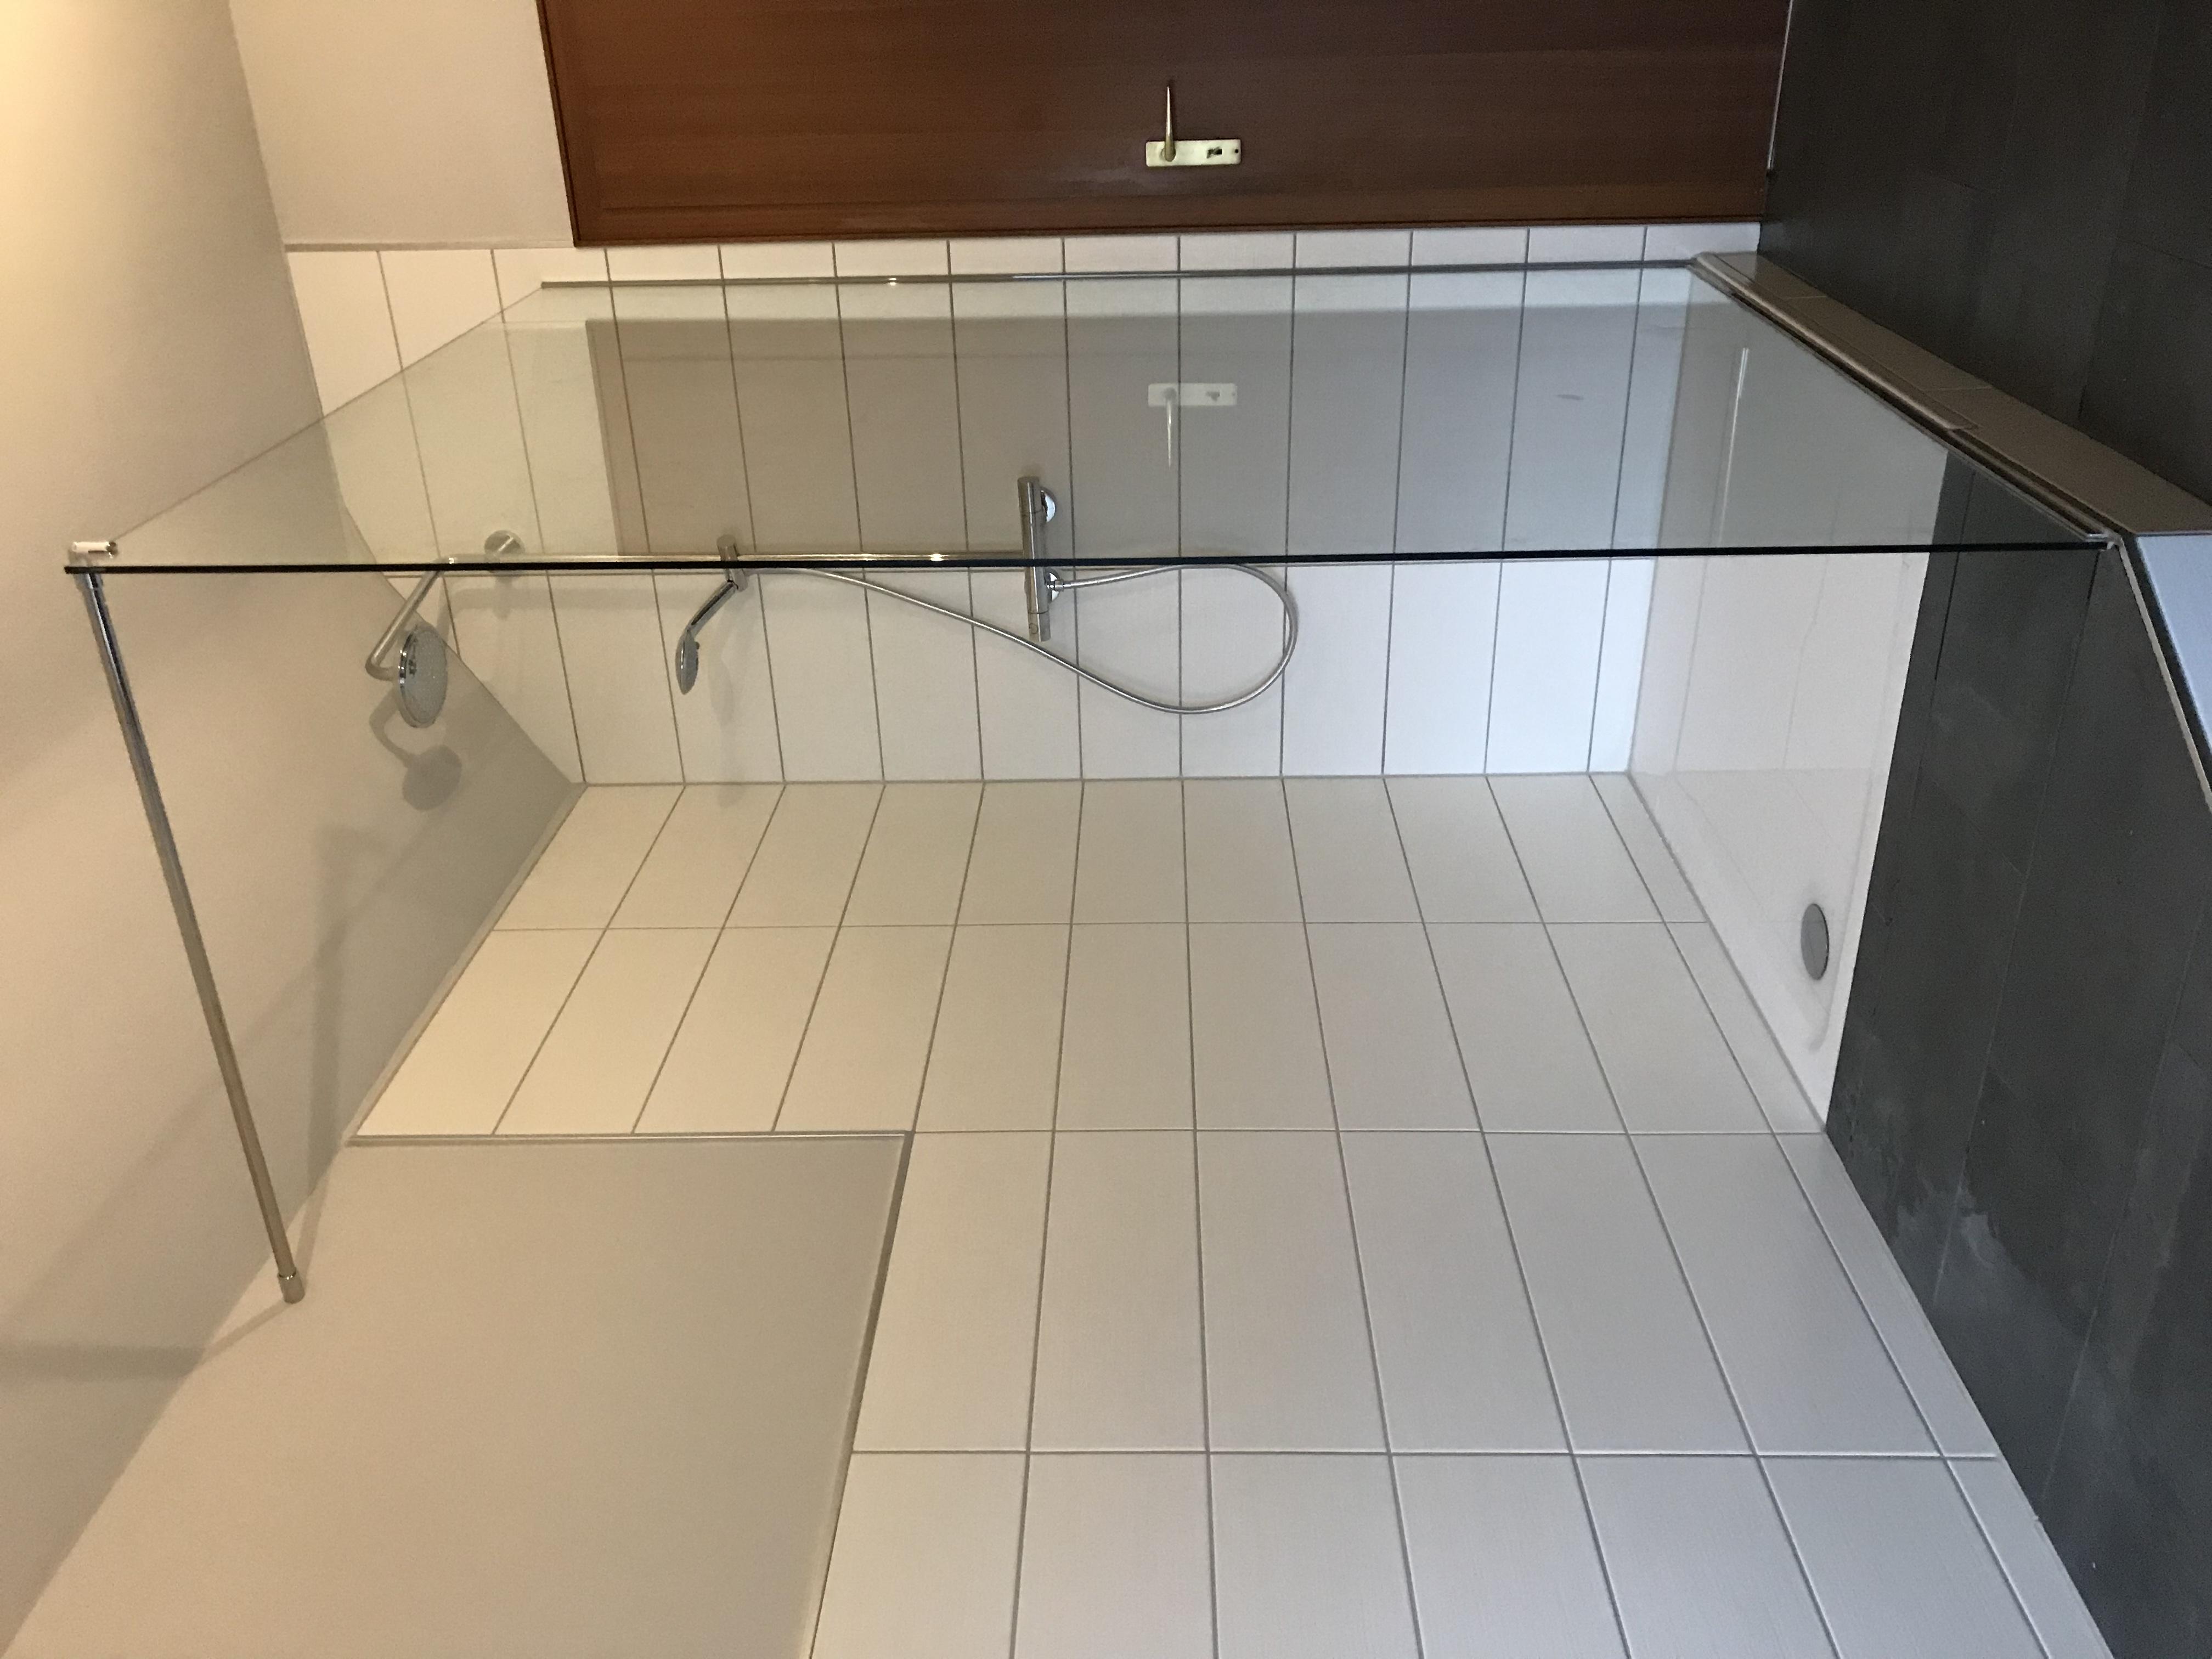 duschkabinen nach ma archive glas goldschmidt gmbh co kg. Black Bedroom Furniture Sets. Home Design Ideas